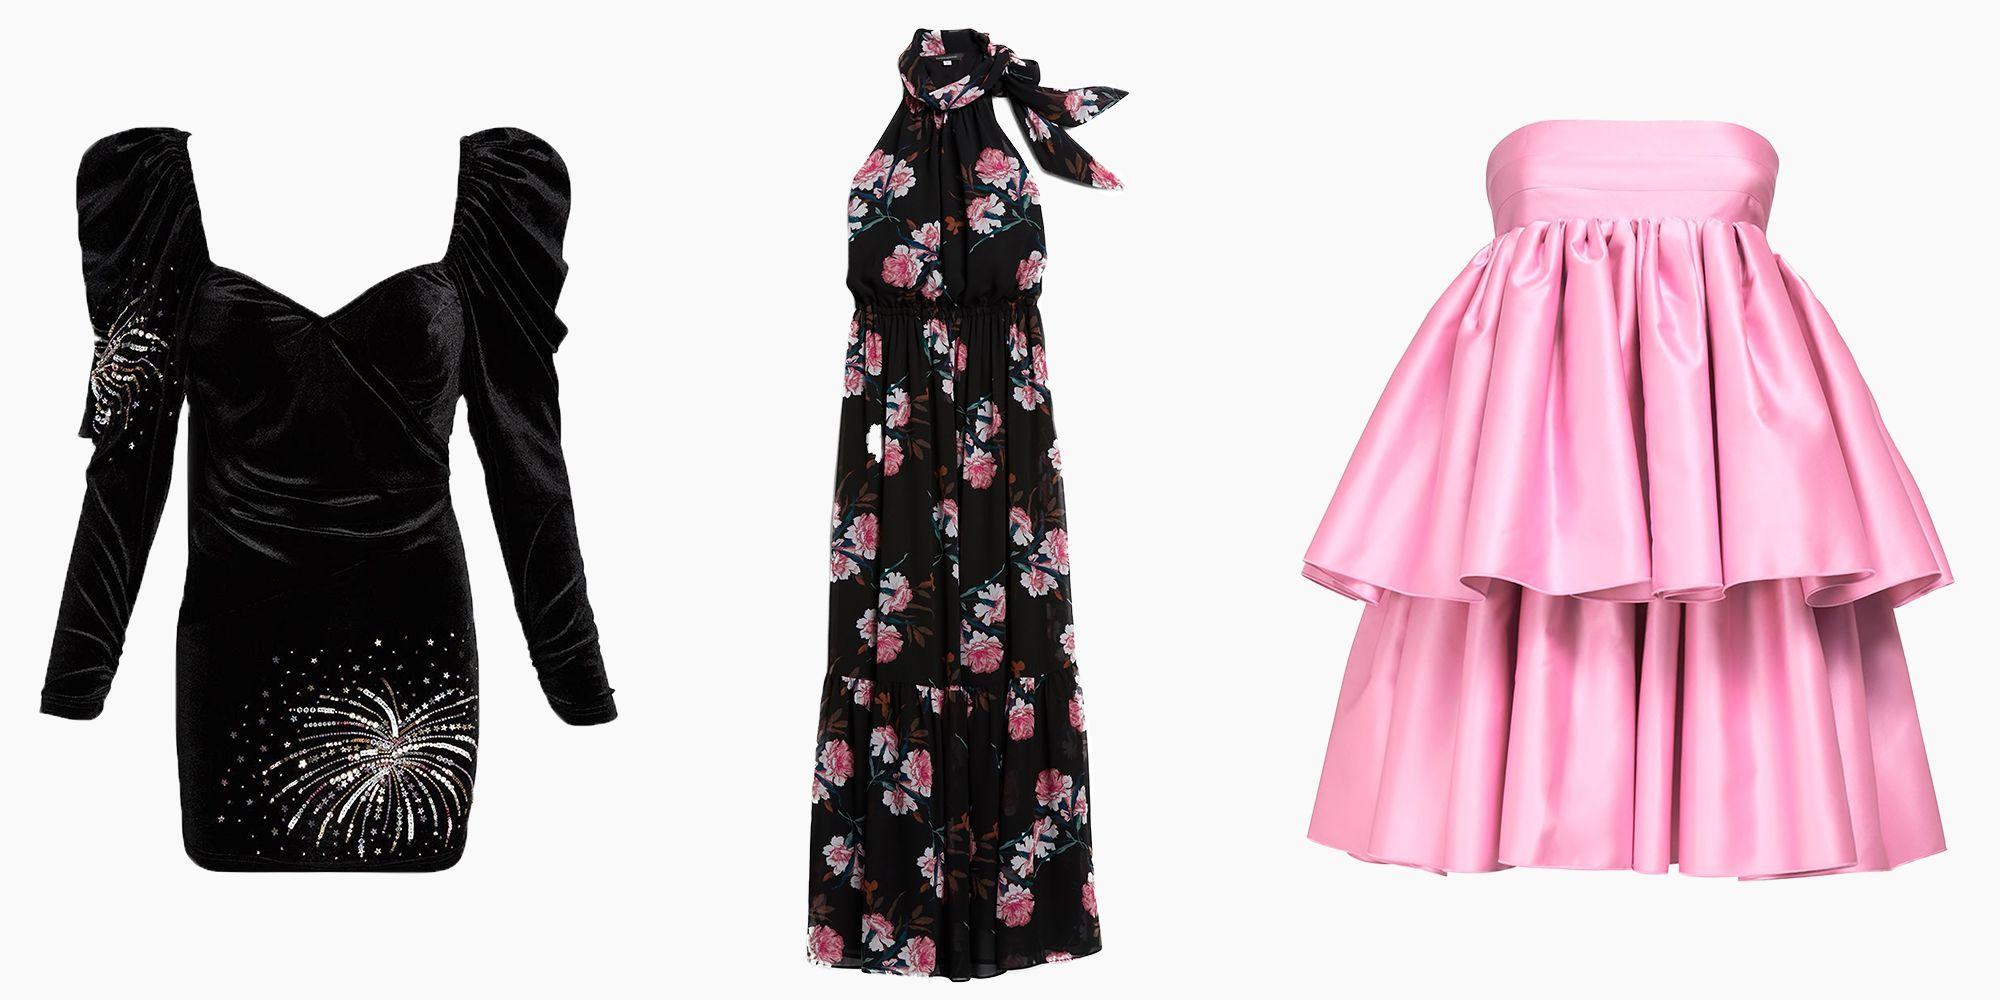 What To Wear To A Fall Wedding 2020 20 Cute Fall Wedding Guest Dress Ideas,Guest Dresses For Beach Wedding